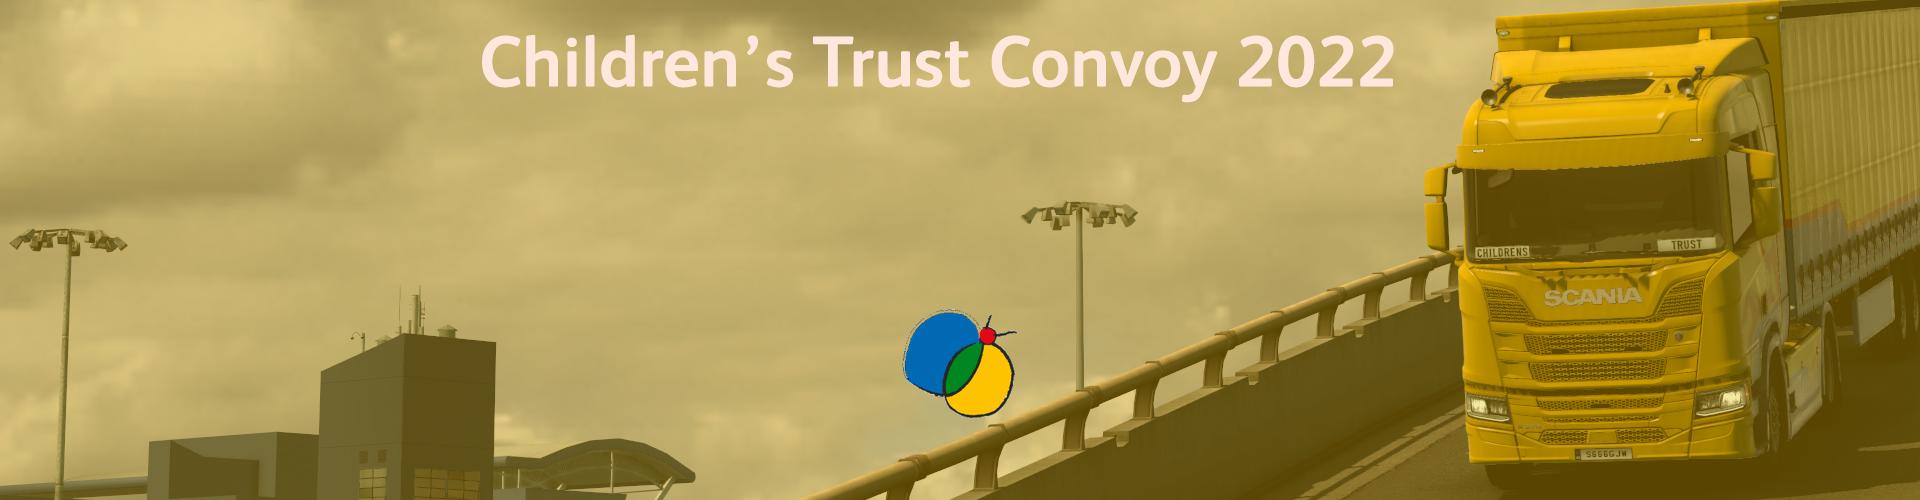 Children's Trust Convoy